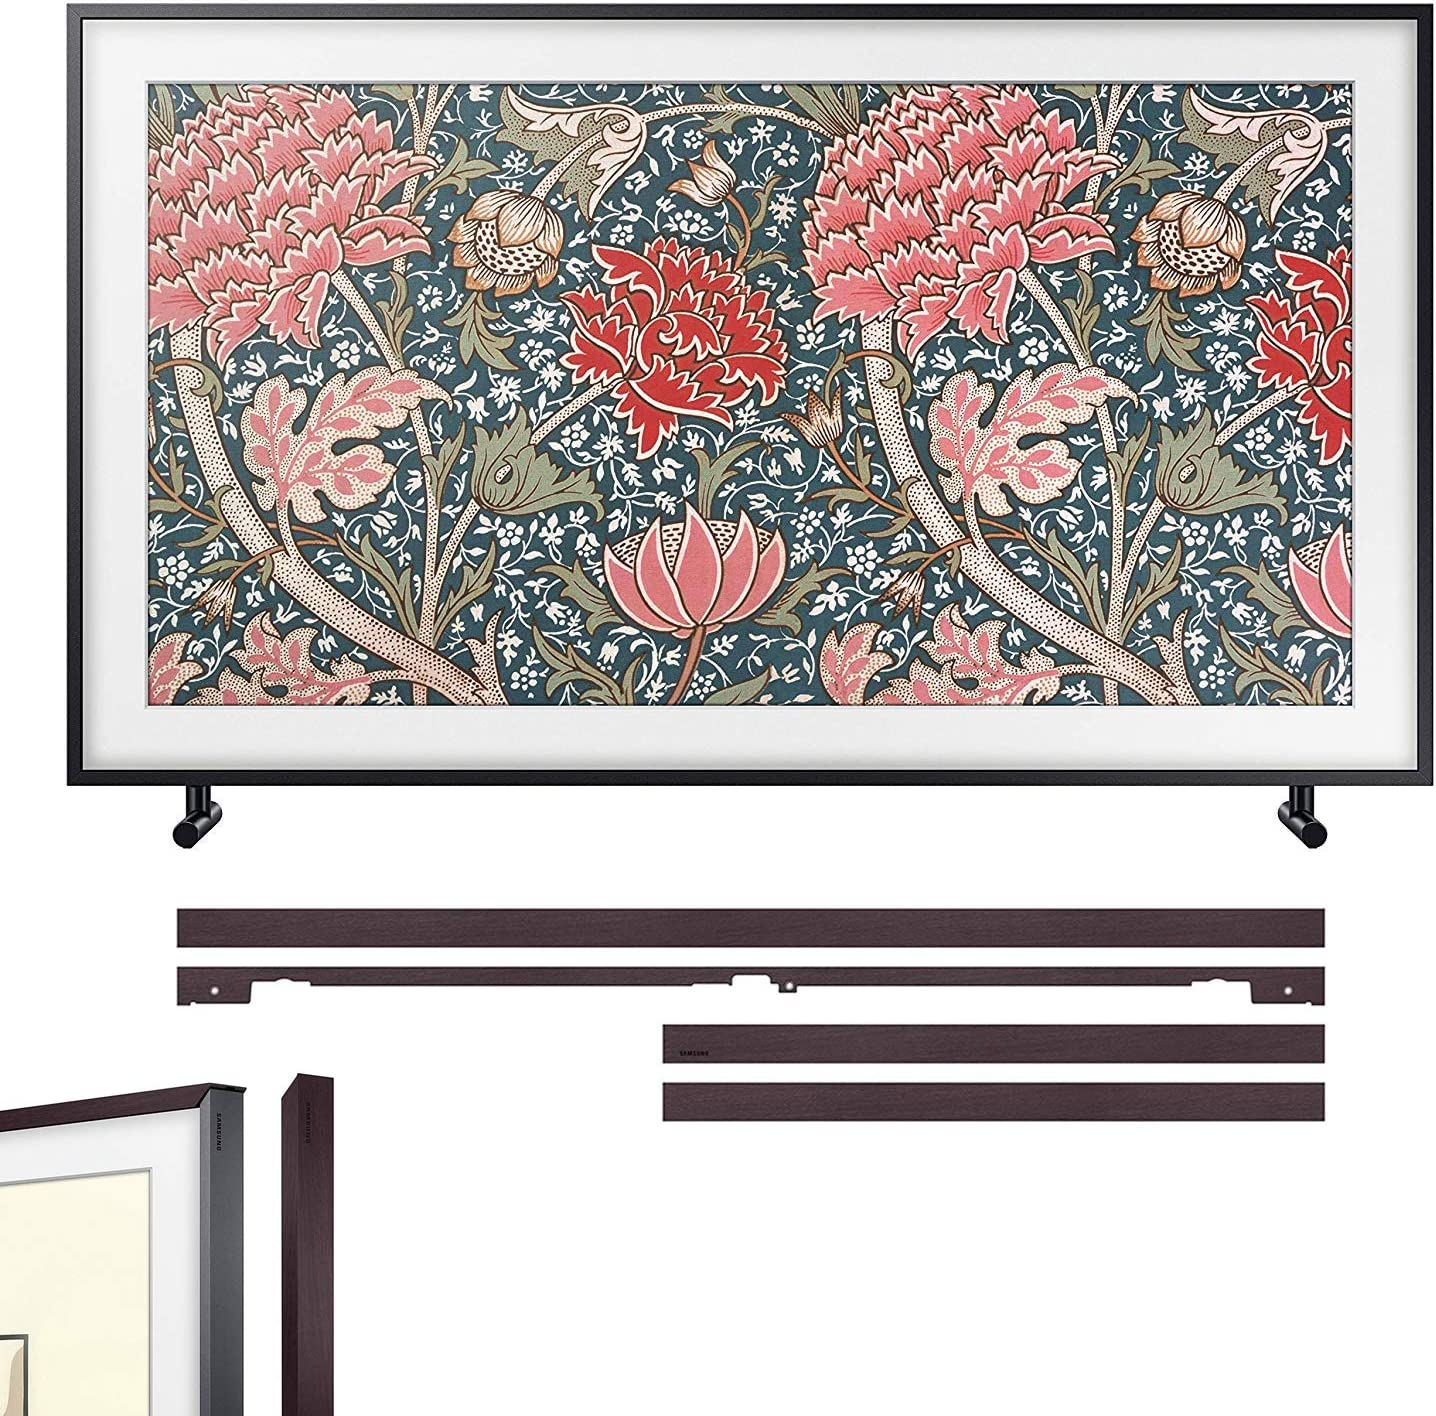 Samsung The Frame 3 0 Qled Smart 4k Uhd Tv Mit Extra Elektronik